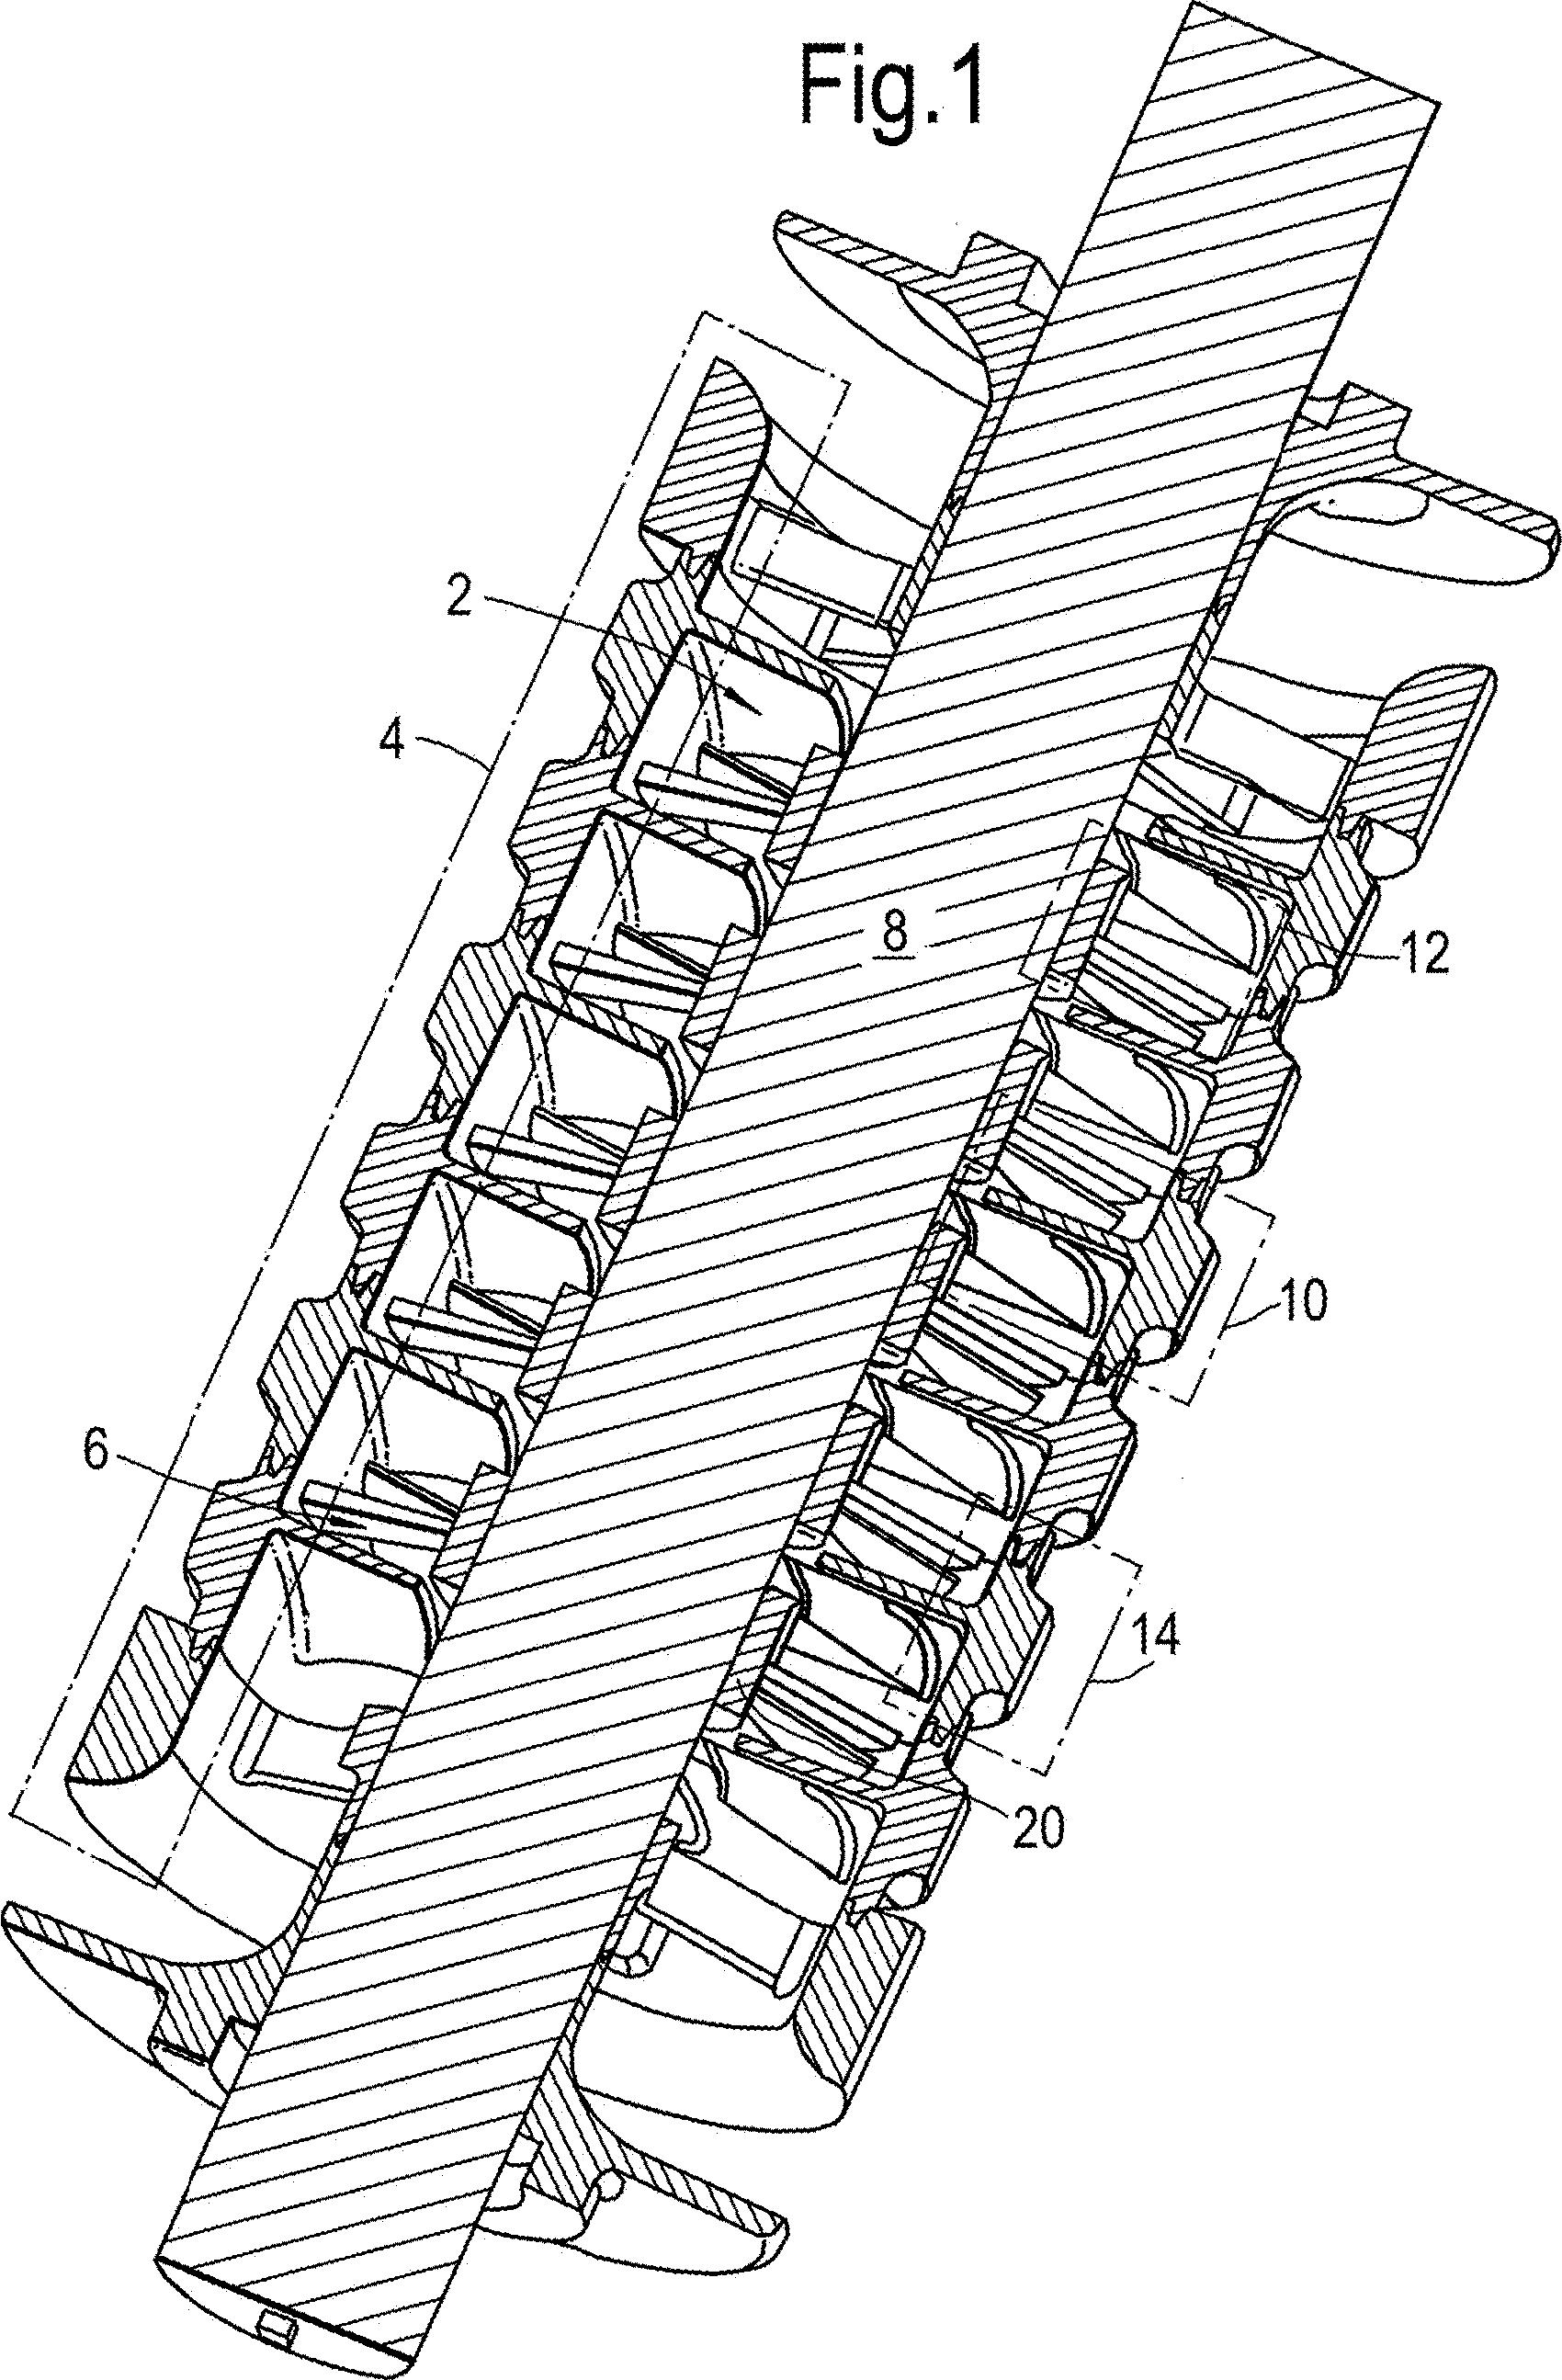 Figure GB2554490A_D0001